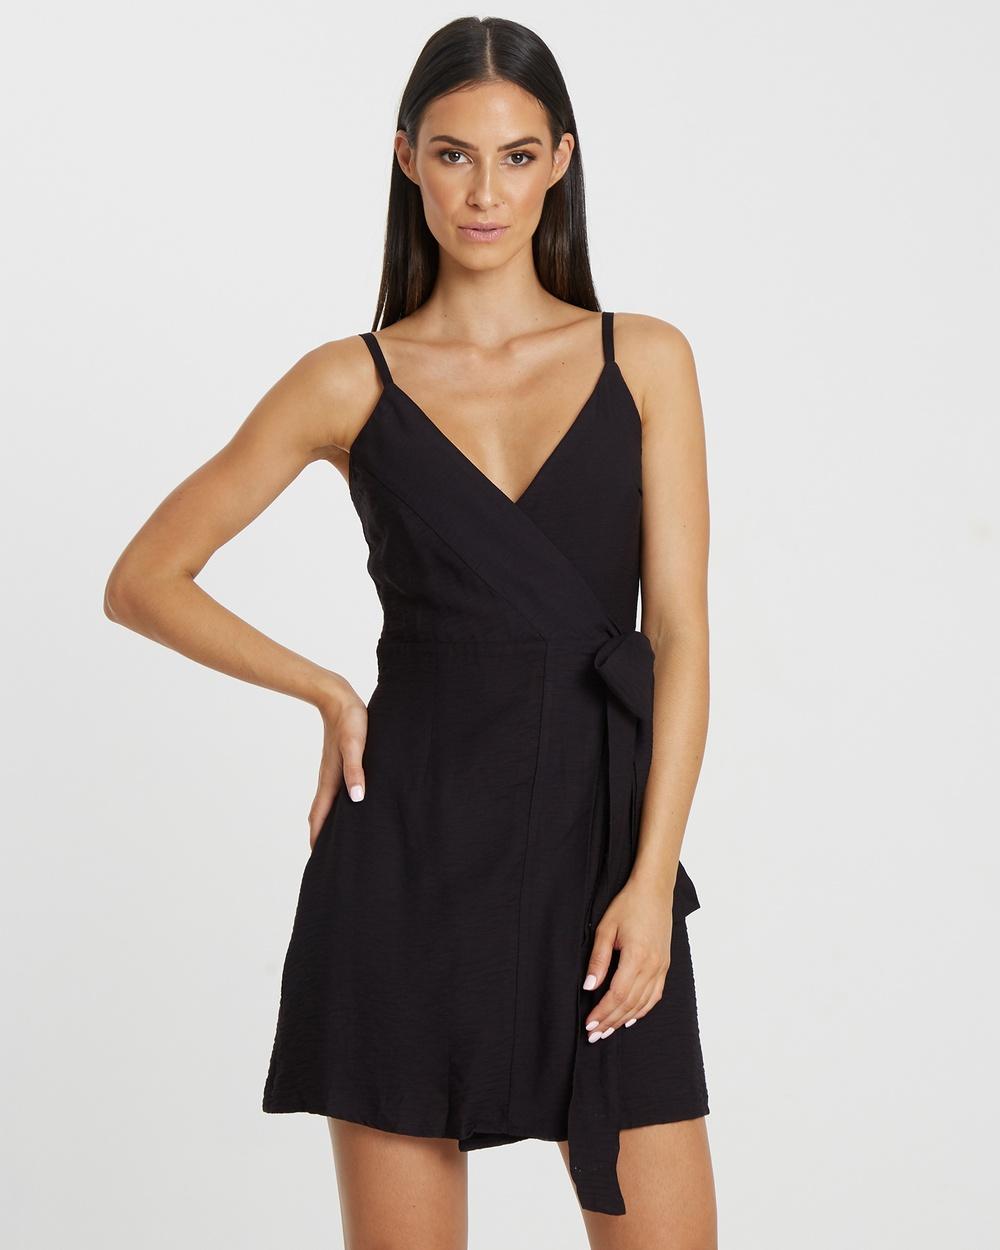 Photo of Tussah Black Romana Wrap Dress - beautiful dress from Tussah online